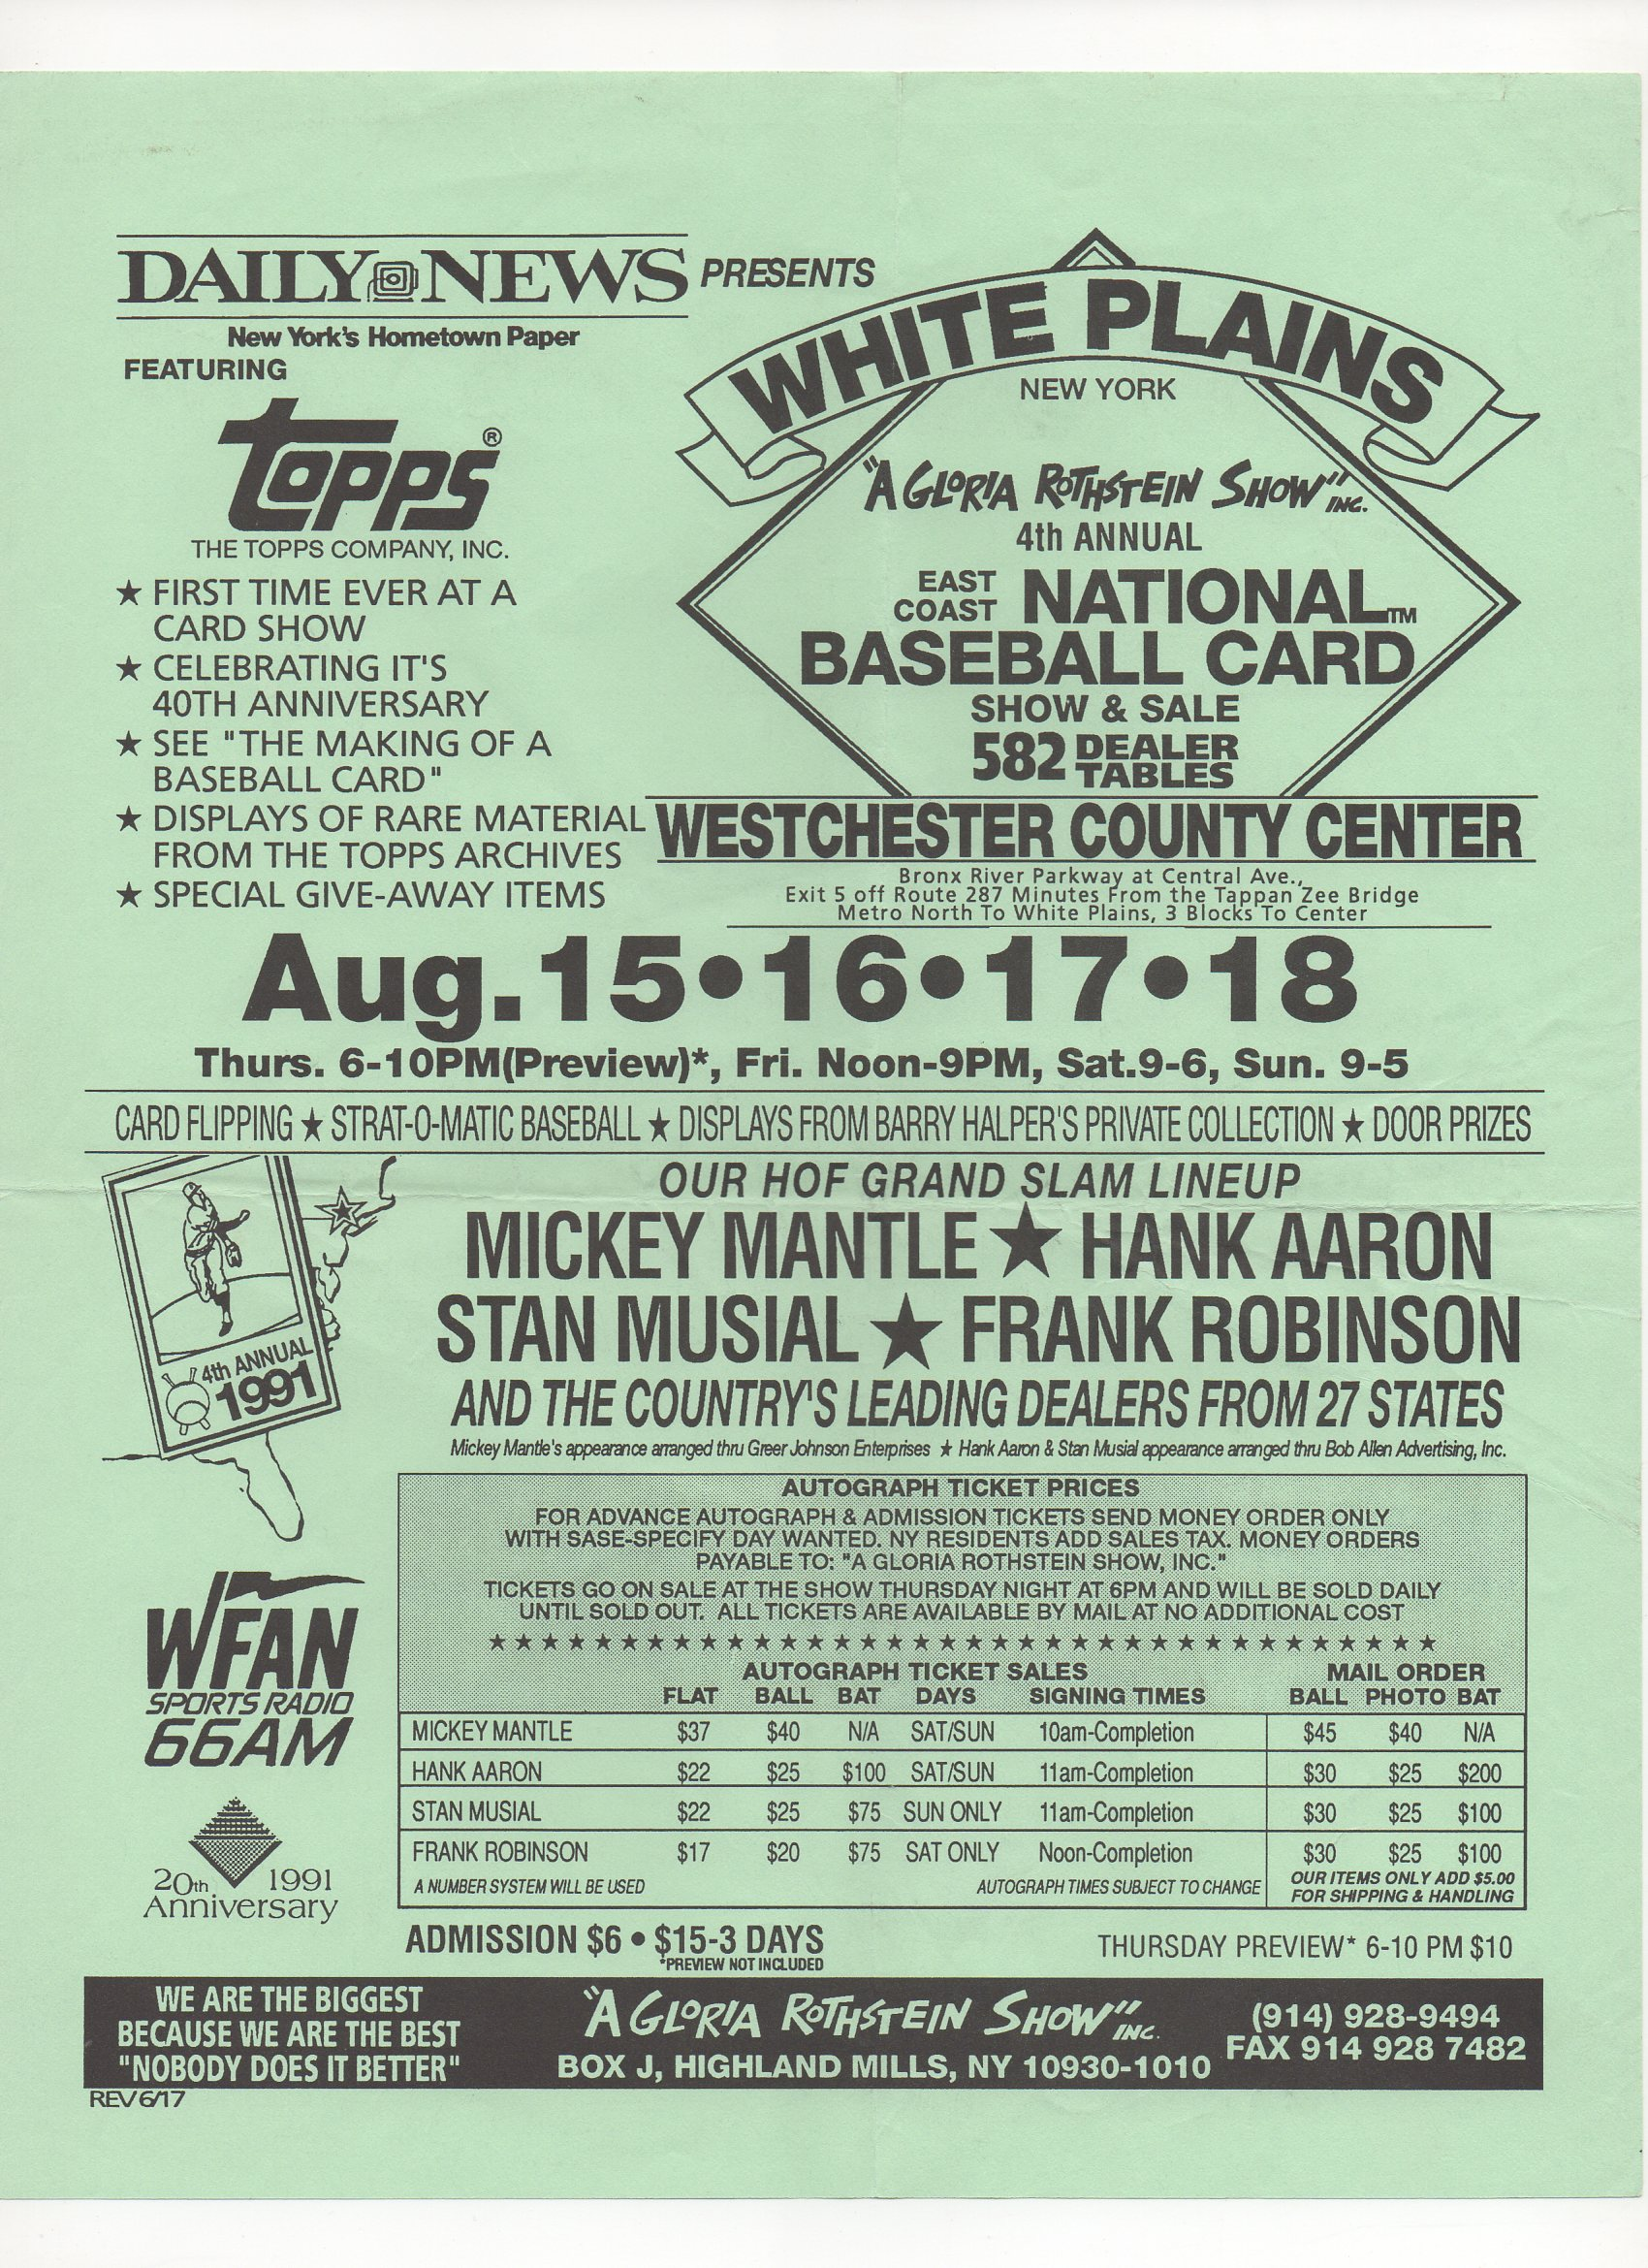 1991 flyer